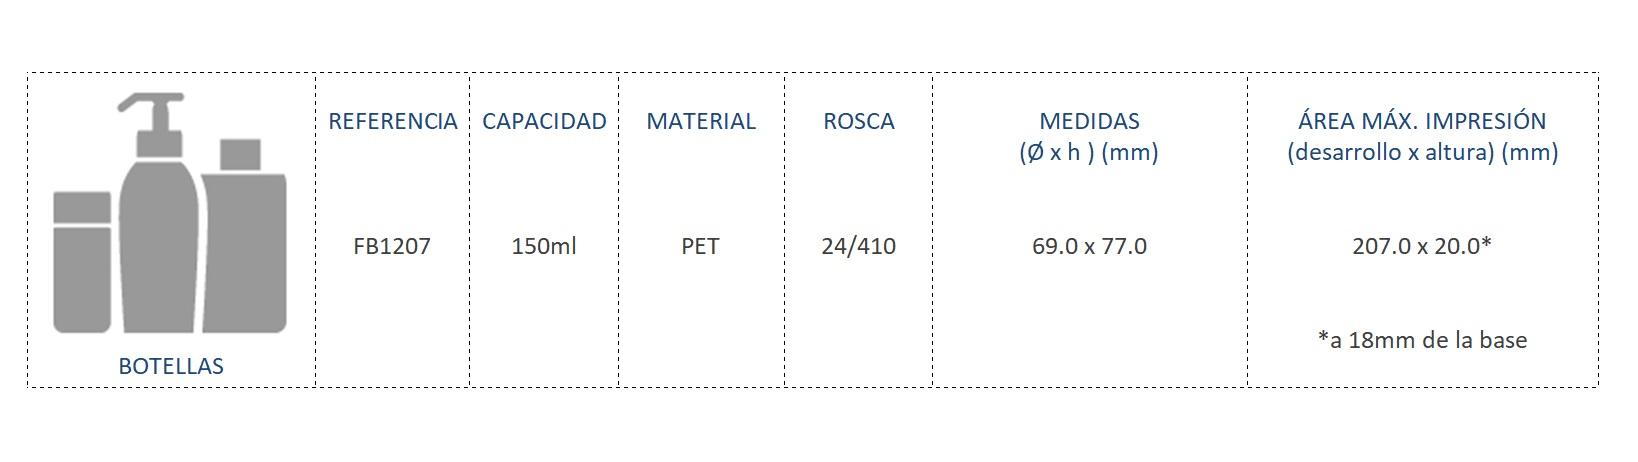 Cuadro de materiales botella FB1207